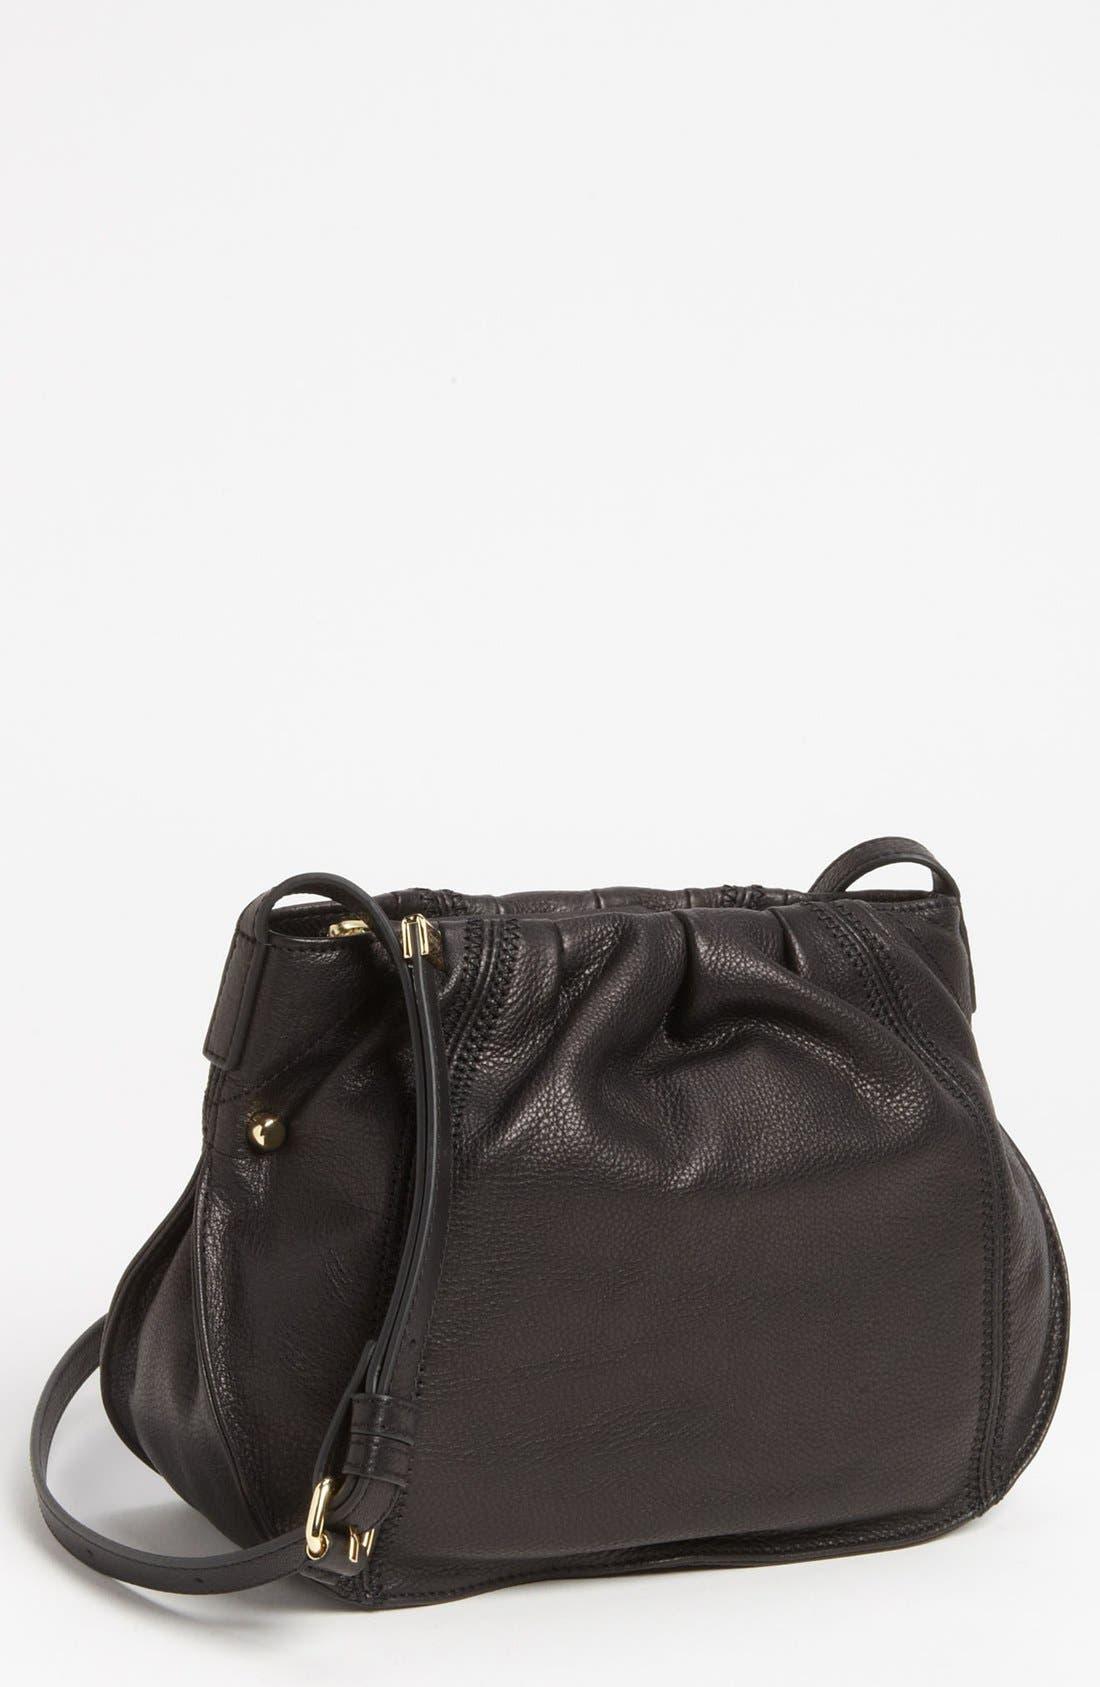 Main Image - Perlina 'Blanca' Crossbody Bag